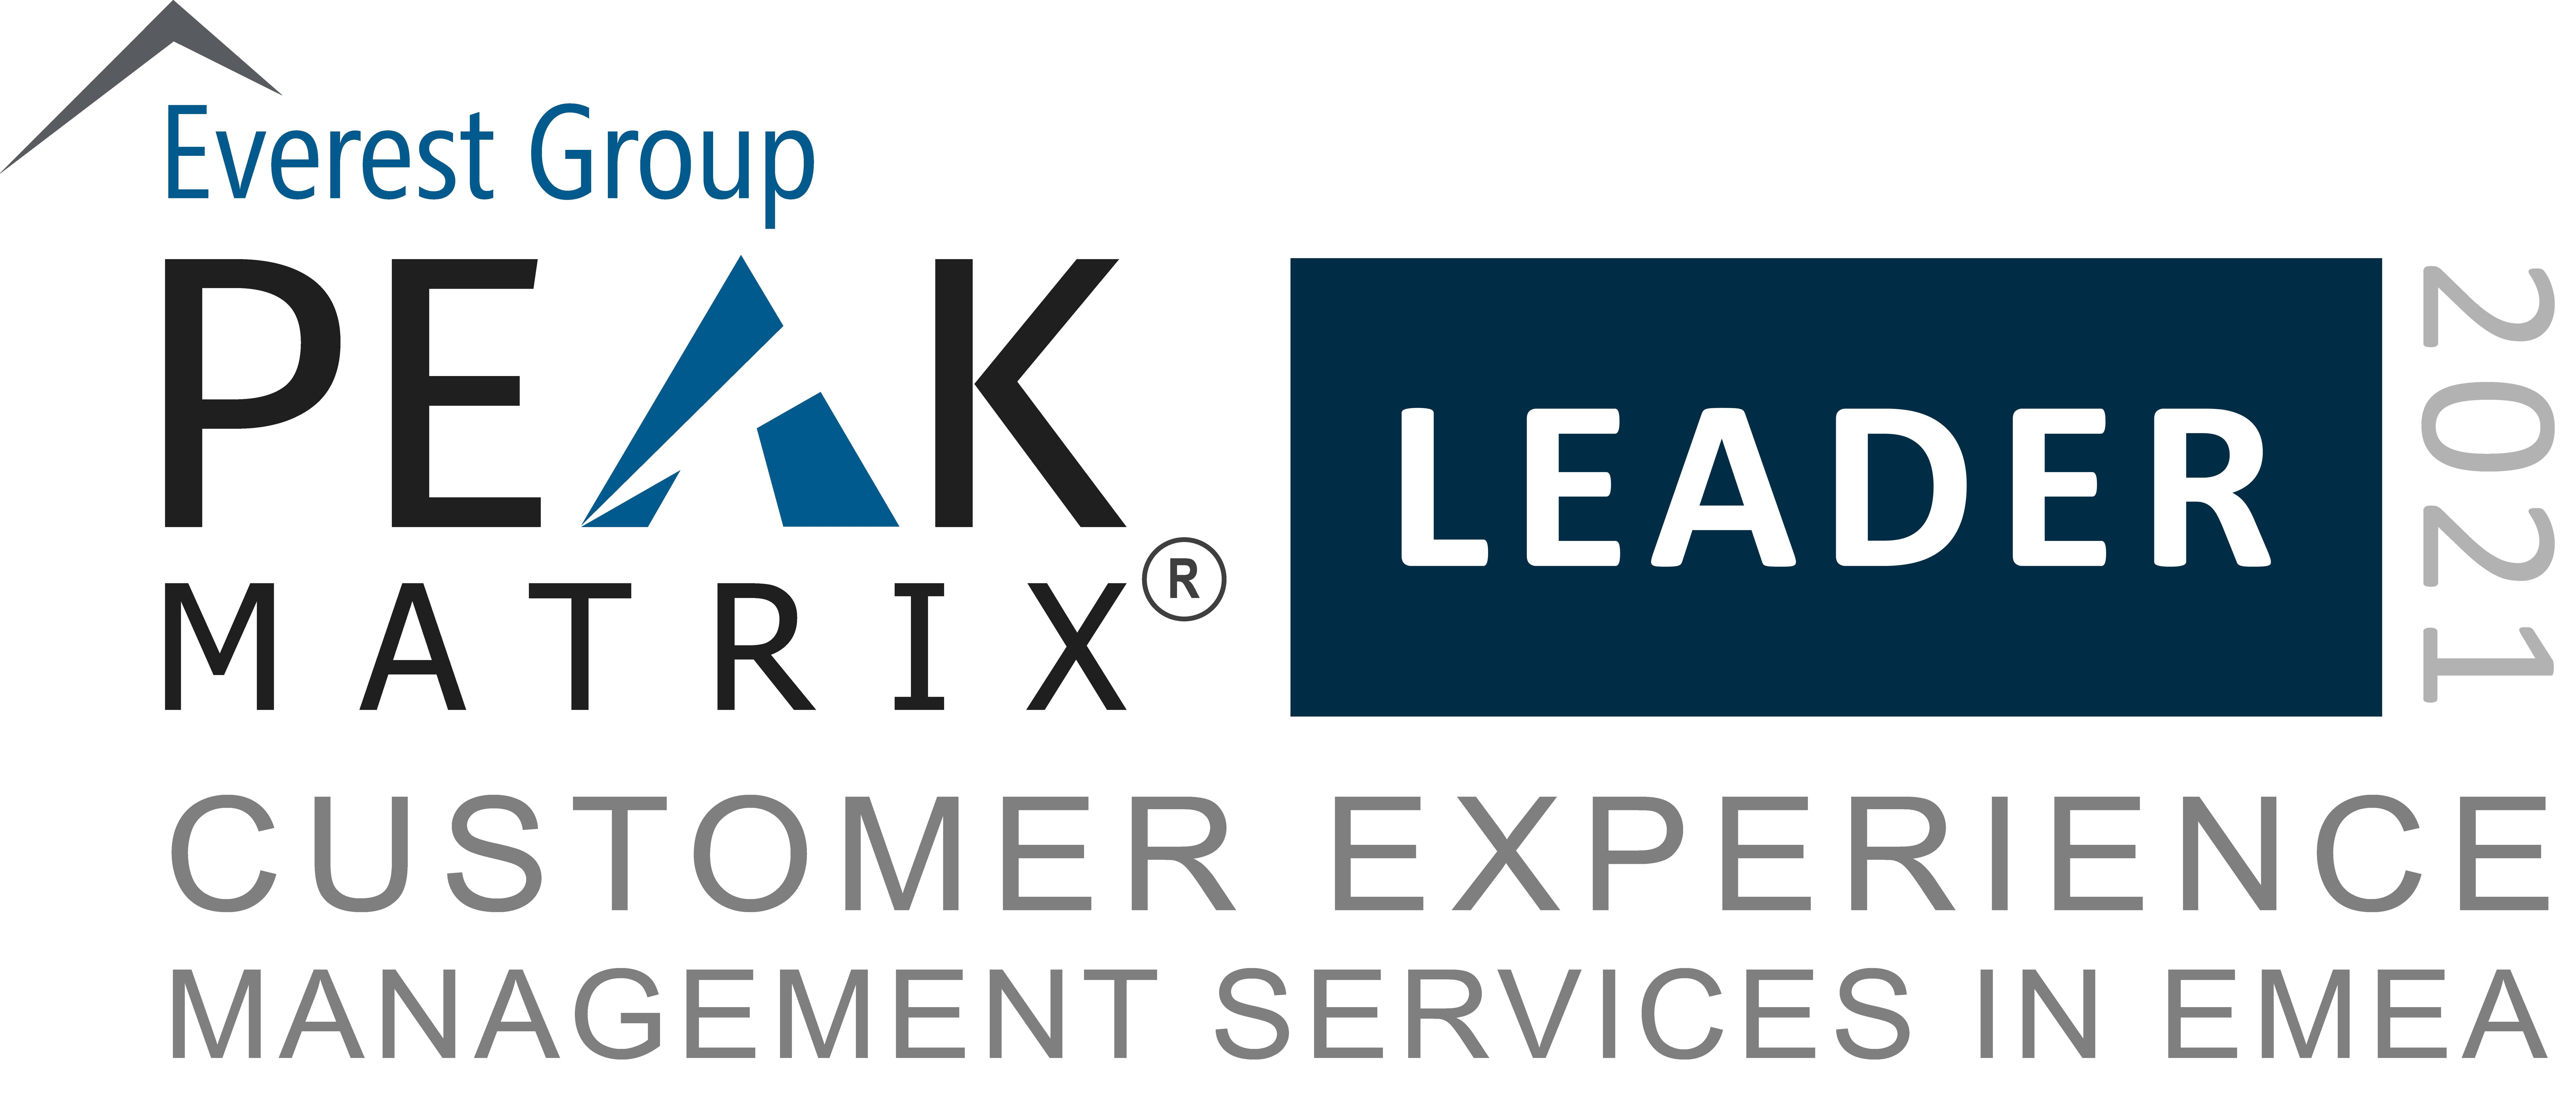 Leader in CMX in EMEA by Everest Group PEAK Matrix® Assessment 2021